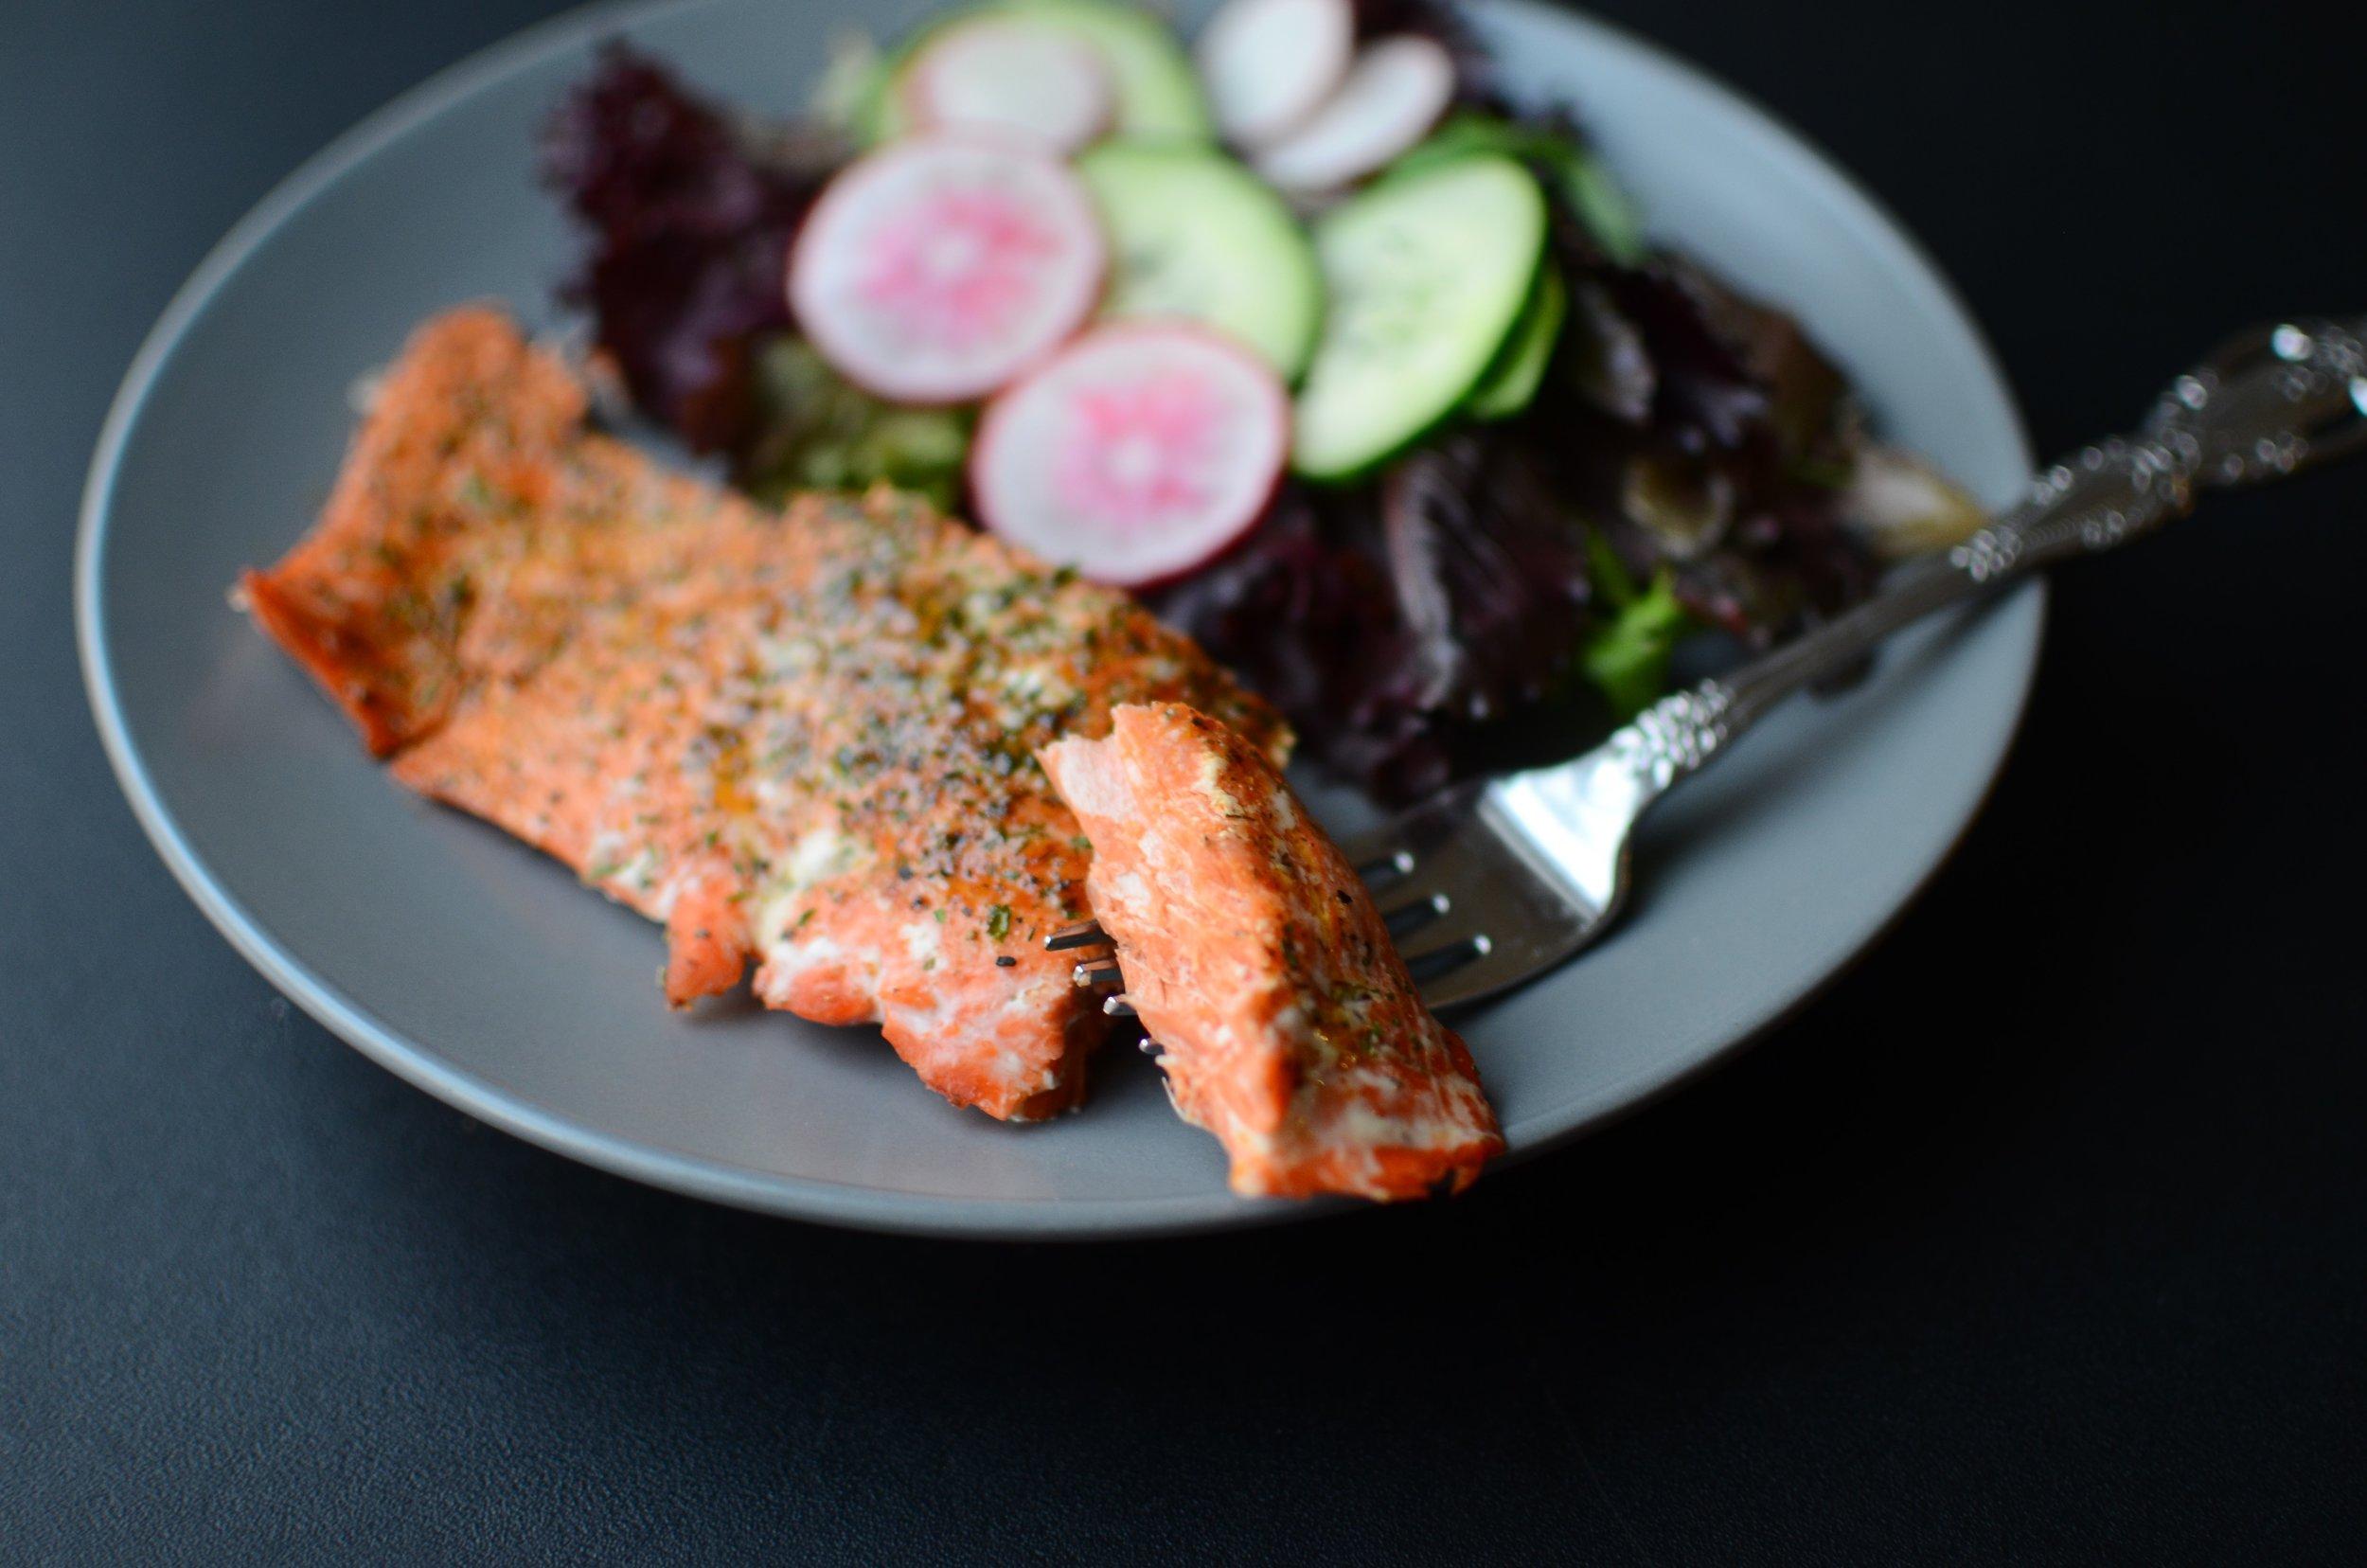 captain jack's salmon rub recipe. sockeye salmon dry rub recipe. best herbs and spices to use on salmon. roasting a salmon fillet. recipe for wild alaskan salmon.